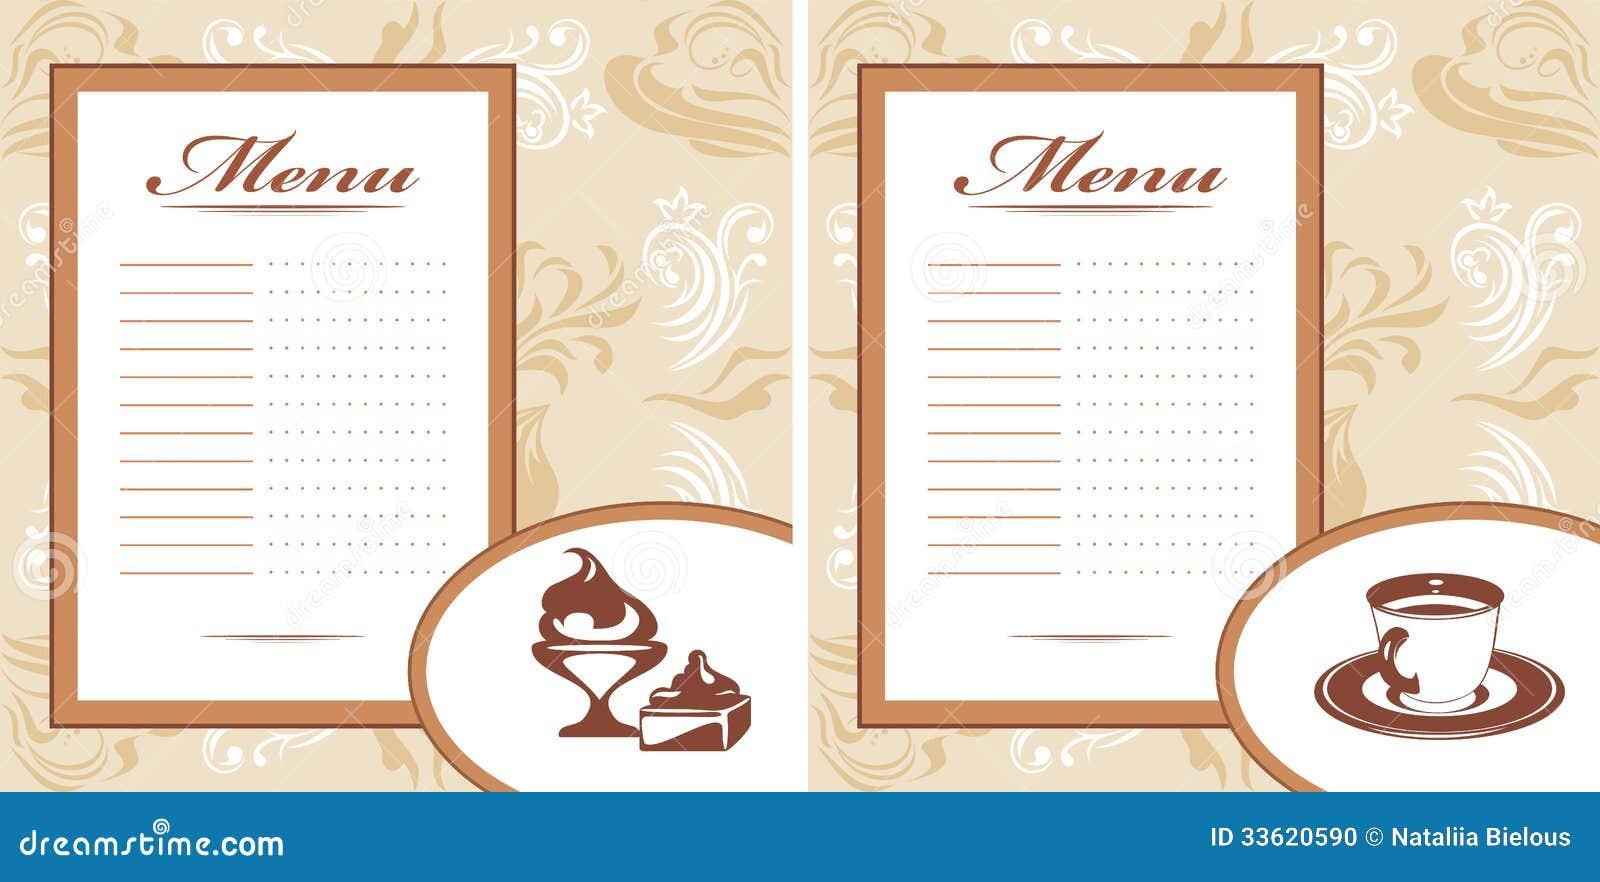 printable restaurant menu templates